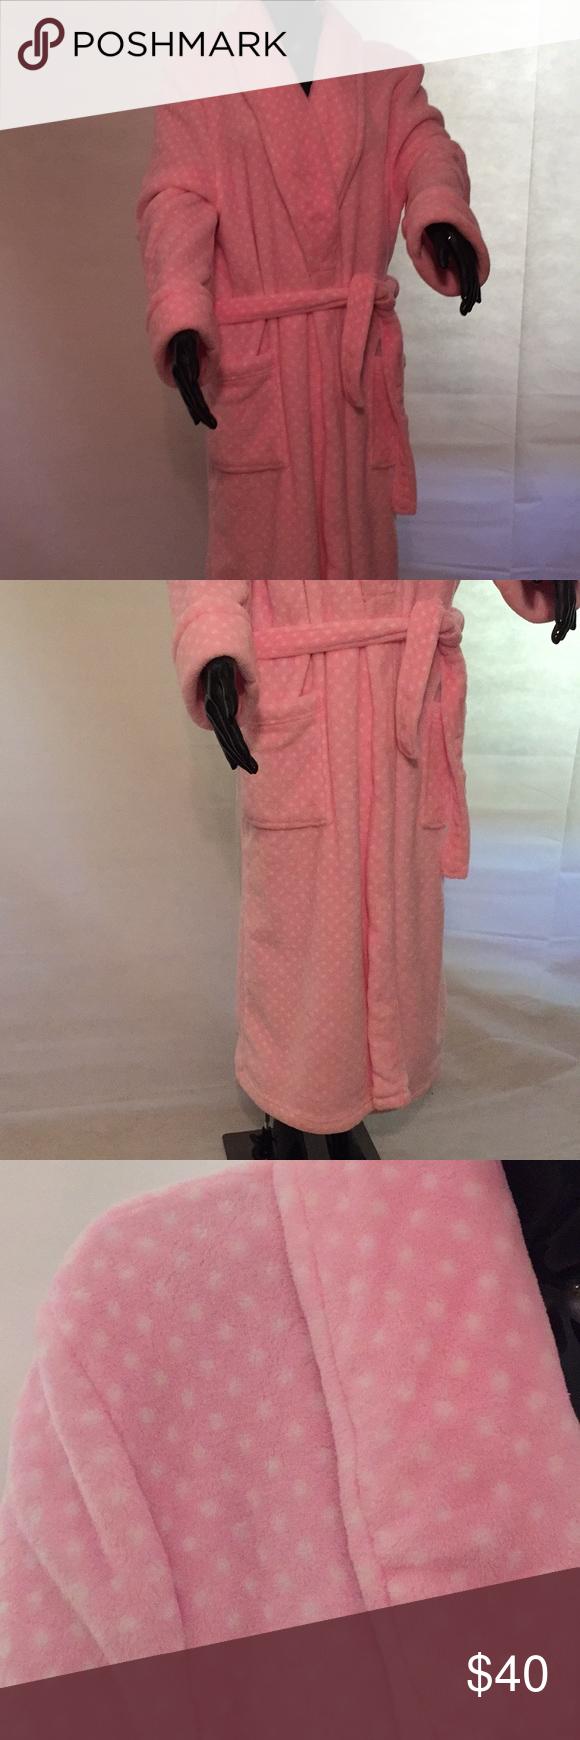 variety styles of 2019 colours and striking deft design Noire Jasmine Rose XL super plush robe NWOT Noire Jasmine ...